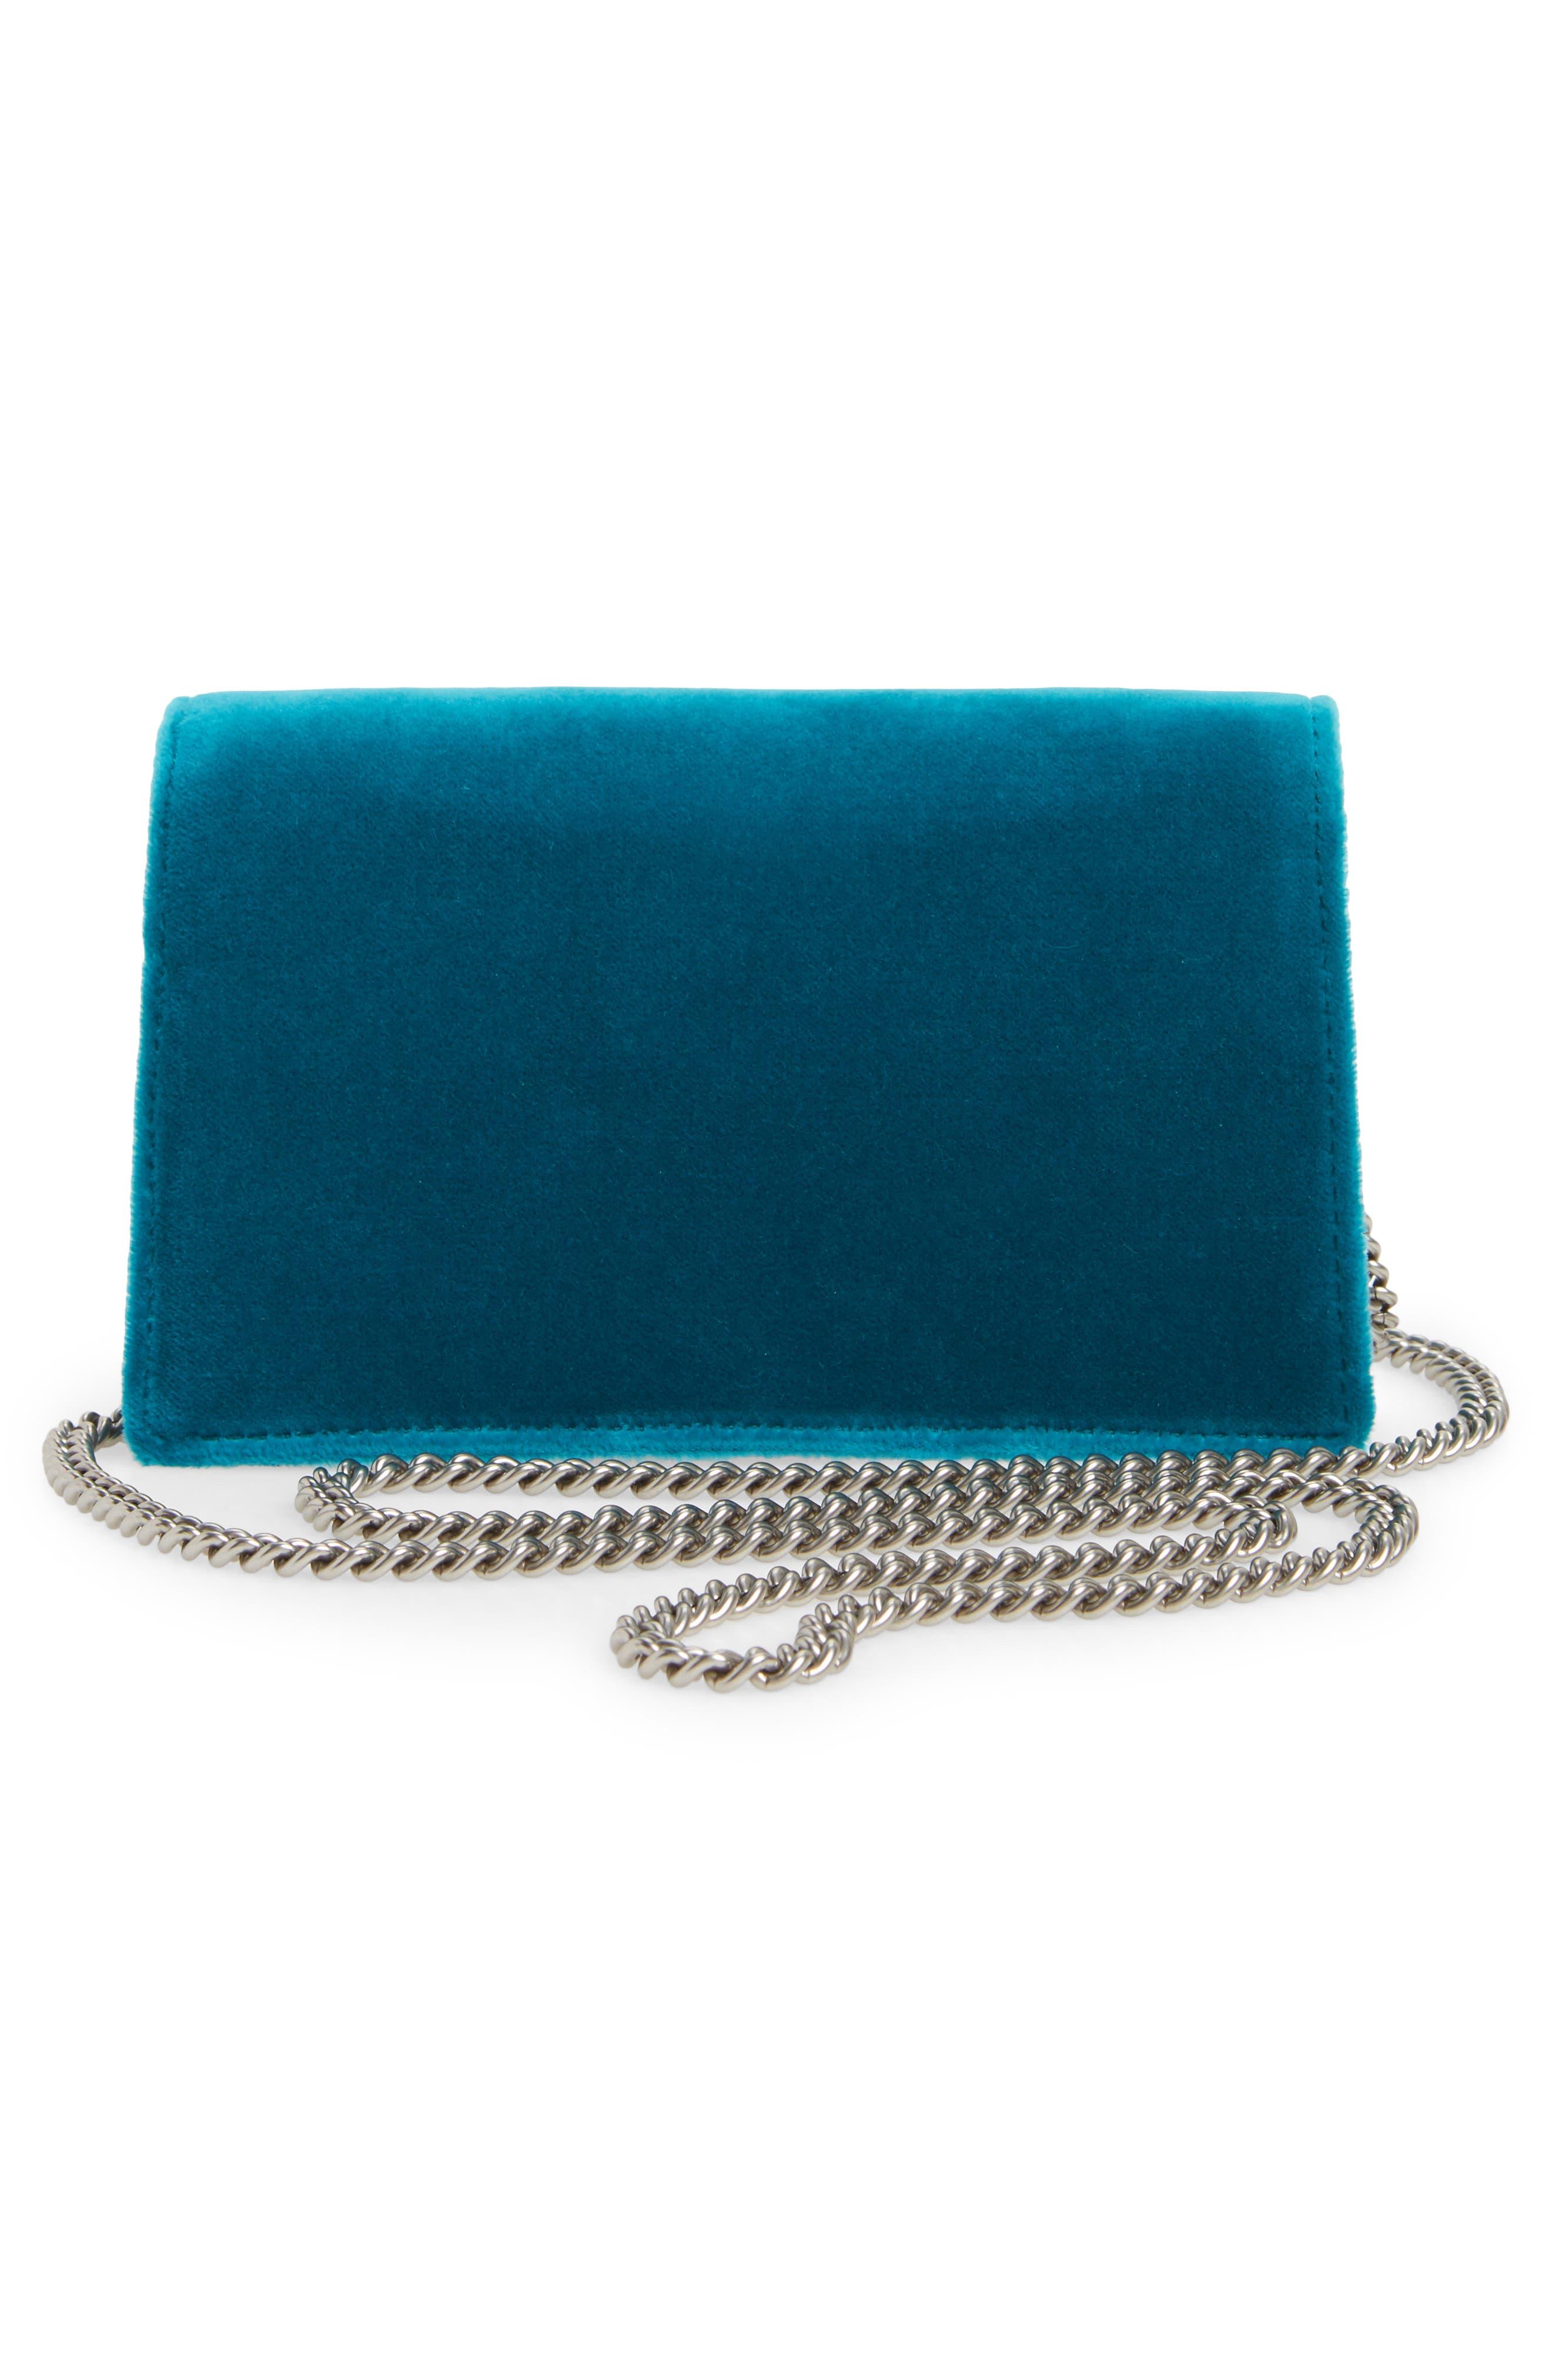 Super Mini Dionysus Velvet Shoulder Bag,                             Alternate thumbnail 3, color,                             PIVONE